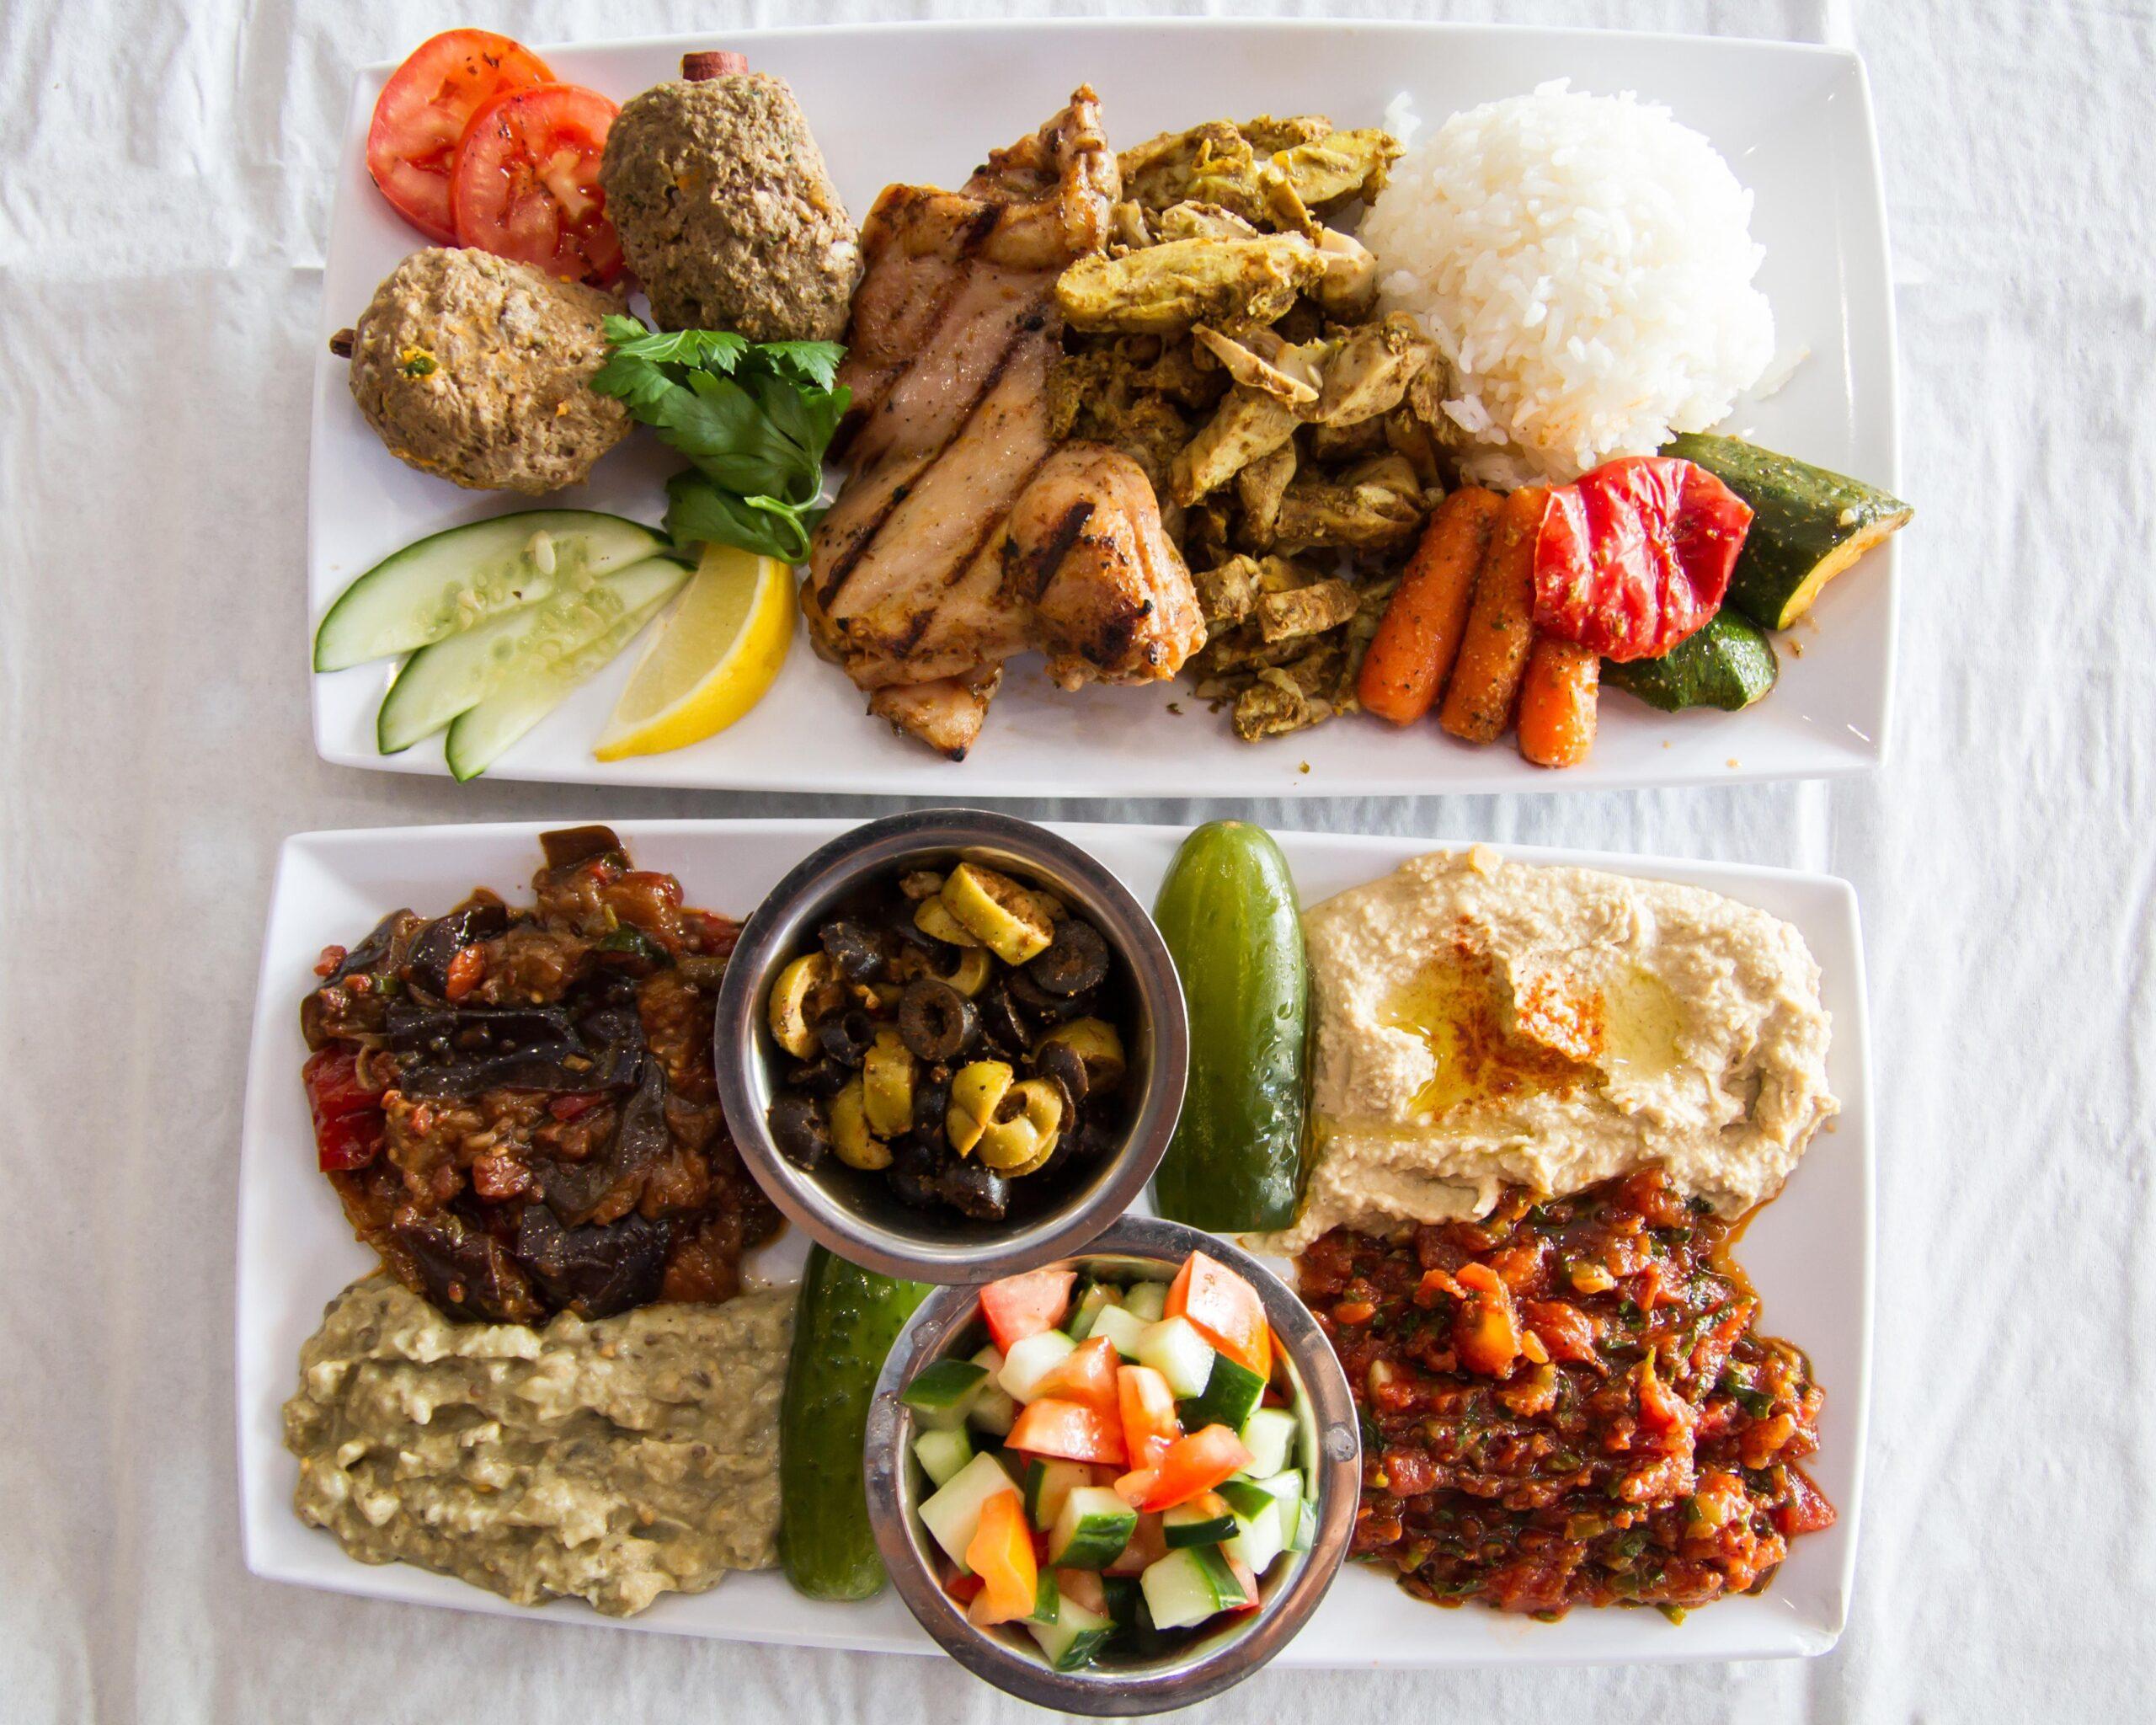 Meat-Restaurant-Meals-2-1